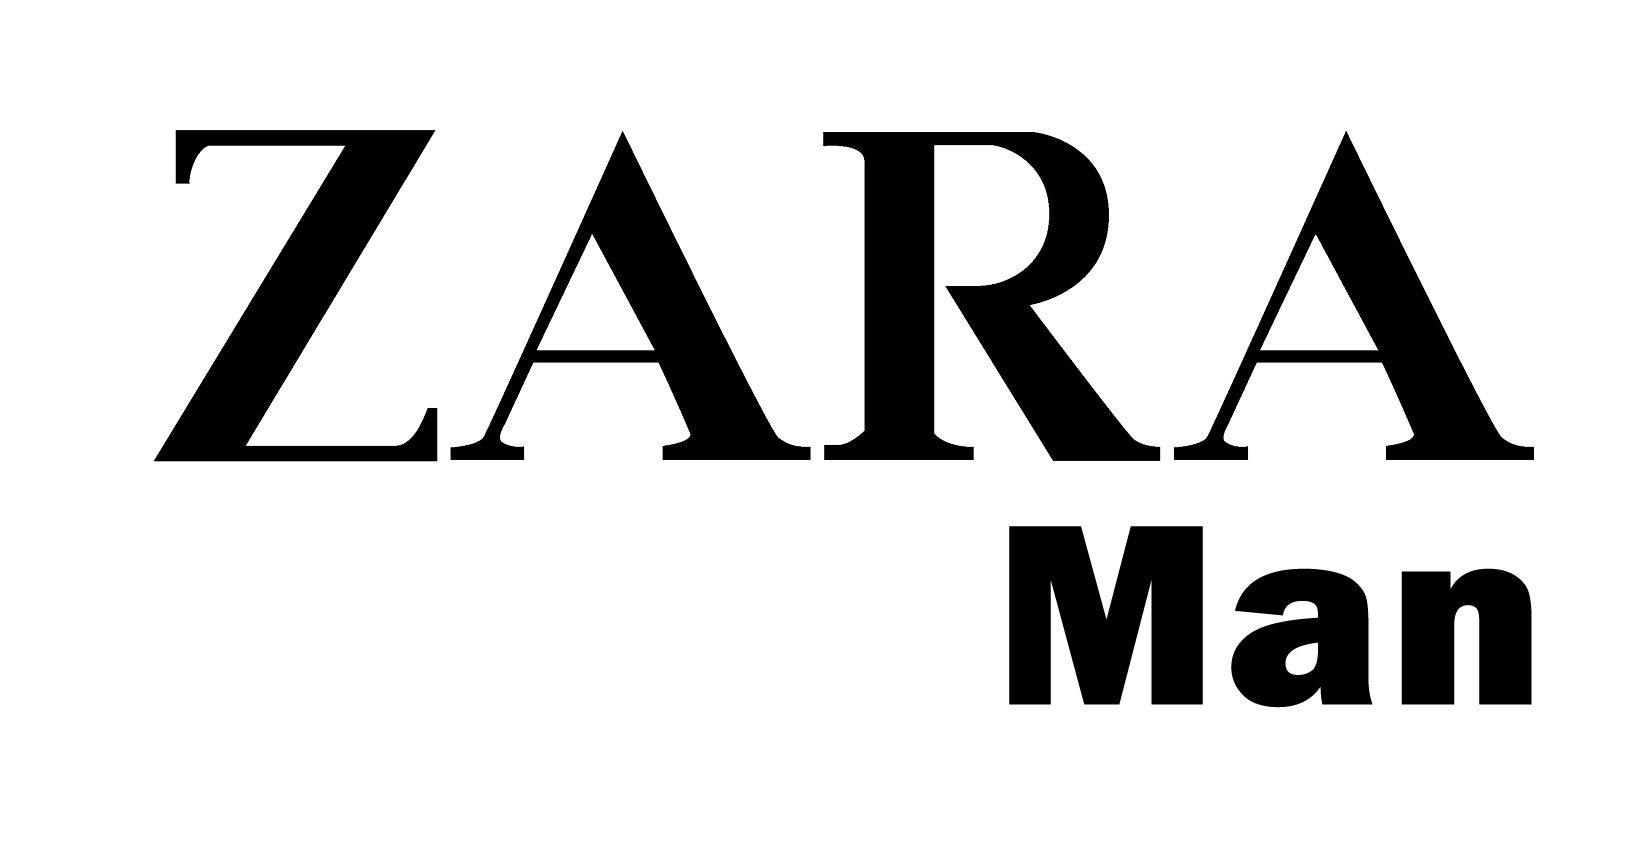 Zara Logo, Zara Symbol, Meaning, History and Evolution